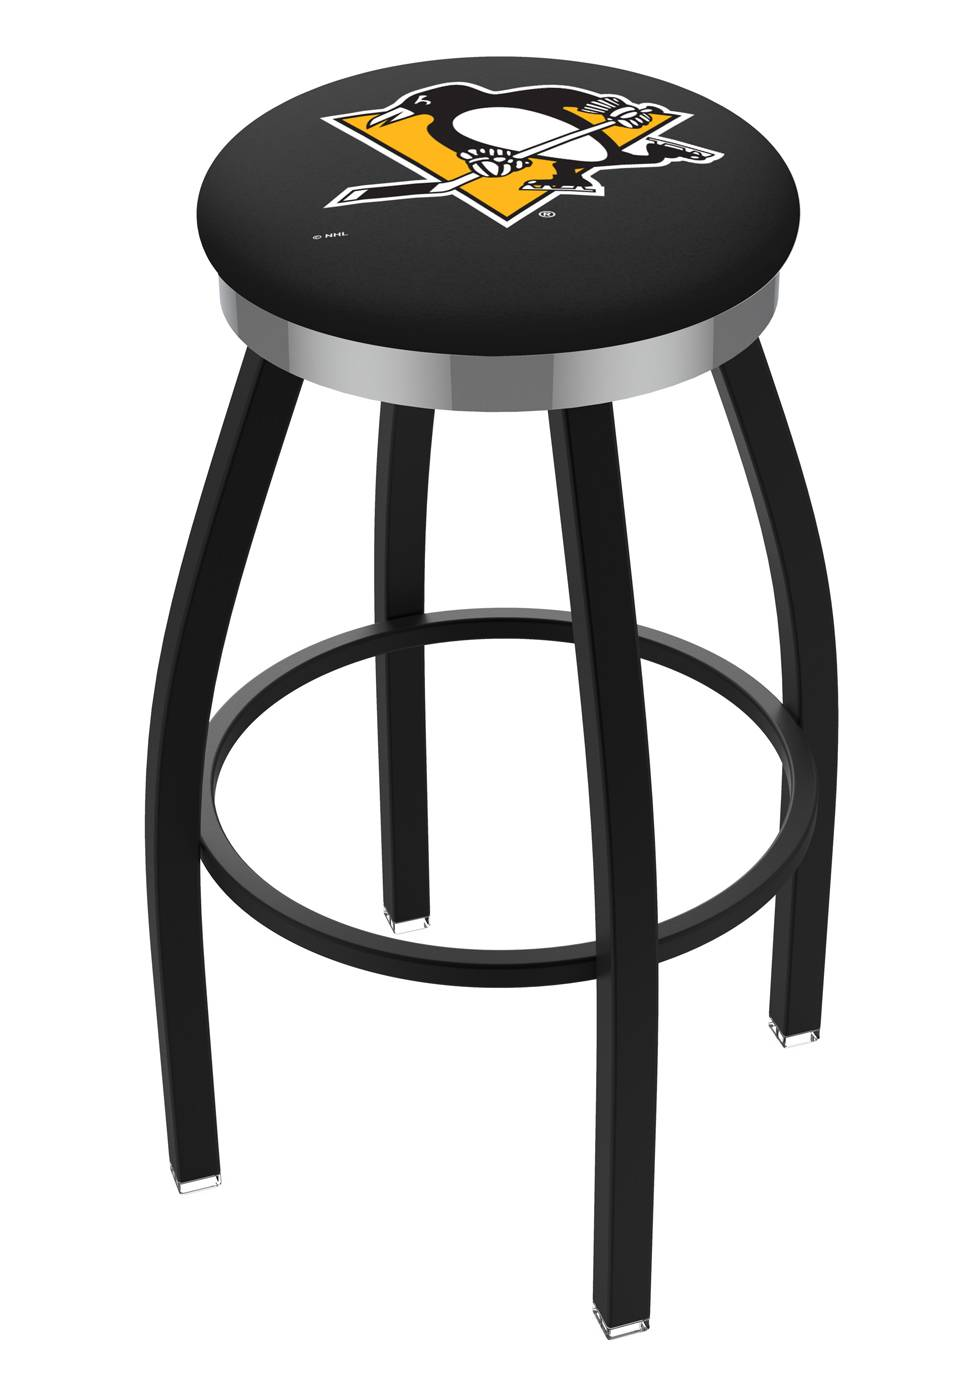 Pittsburgh Penguins Black Swivel Barstool with Chrome  : 952 l8b2cpitpen 25mainProductImageFullSize from www.sportsunlimitedinc.com size 711 x 1200 jpeg 104kB